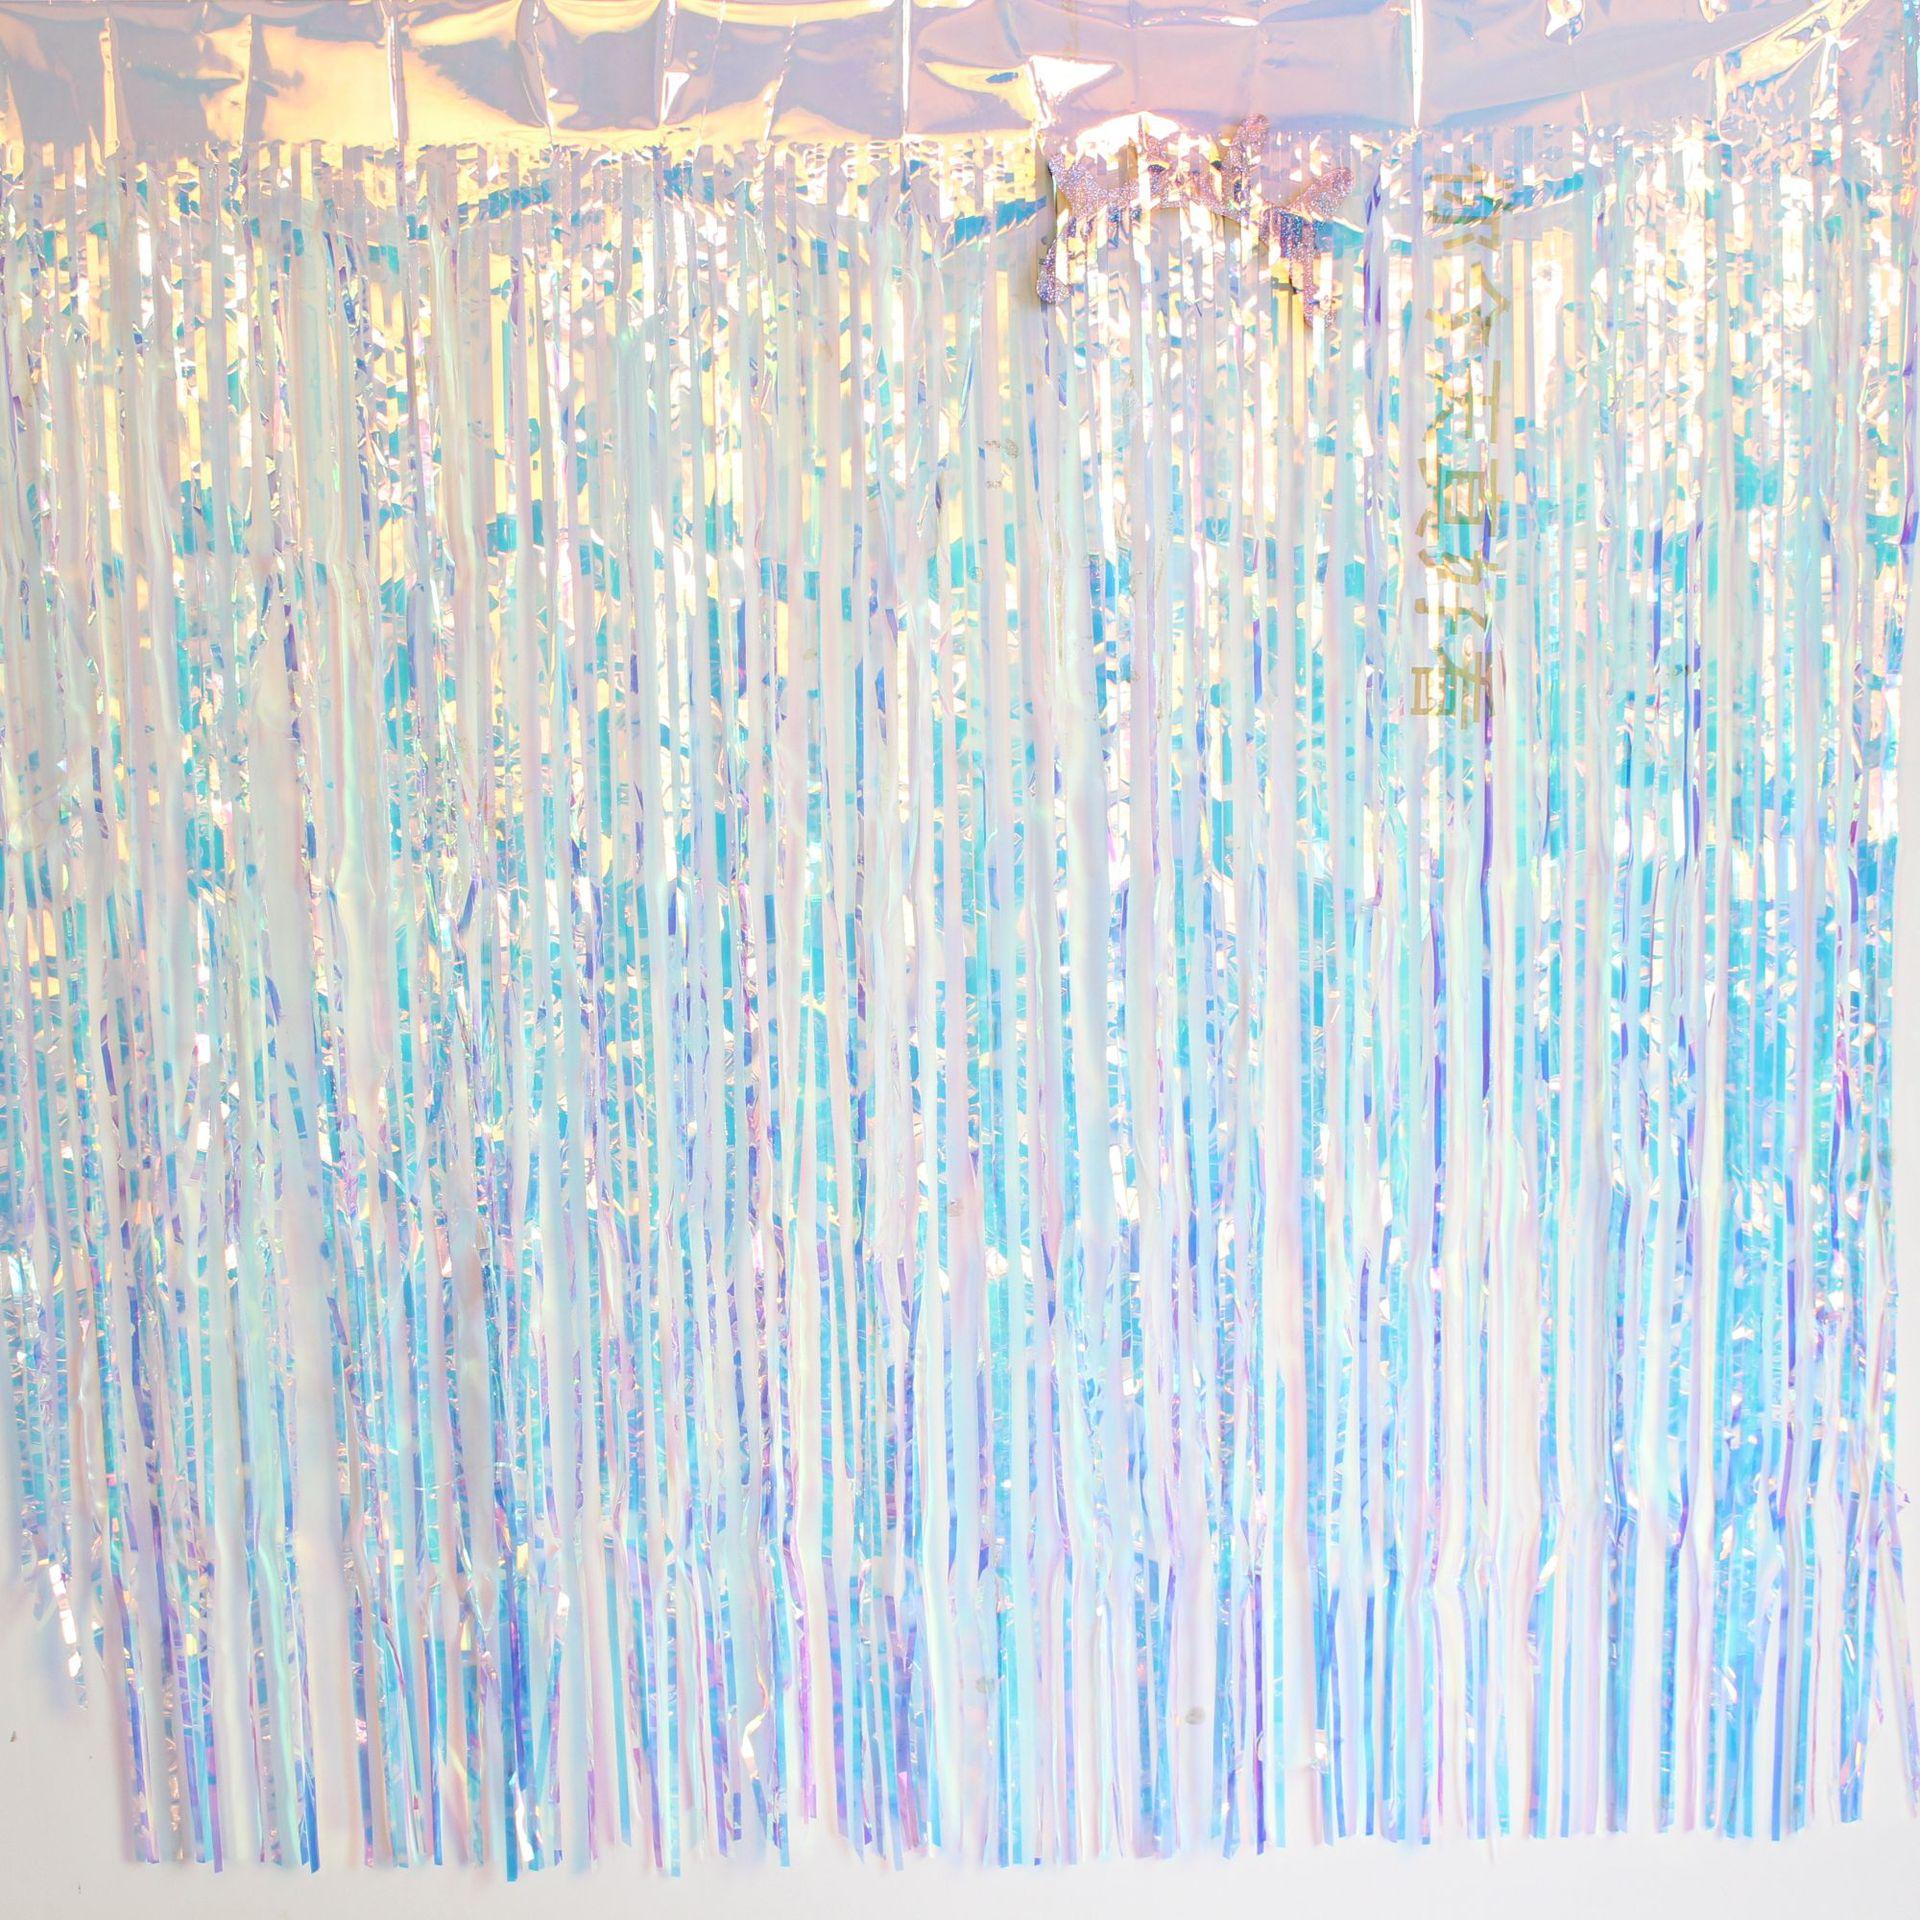 Película de boda transparente de colores decorativos tirar flores habitación de seda de lluvia transparente colorido cortina fiesta suministros